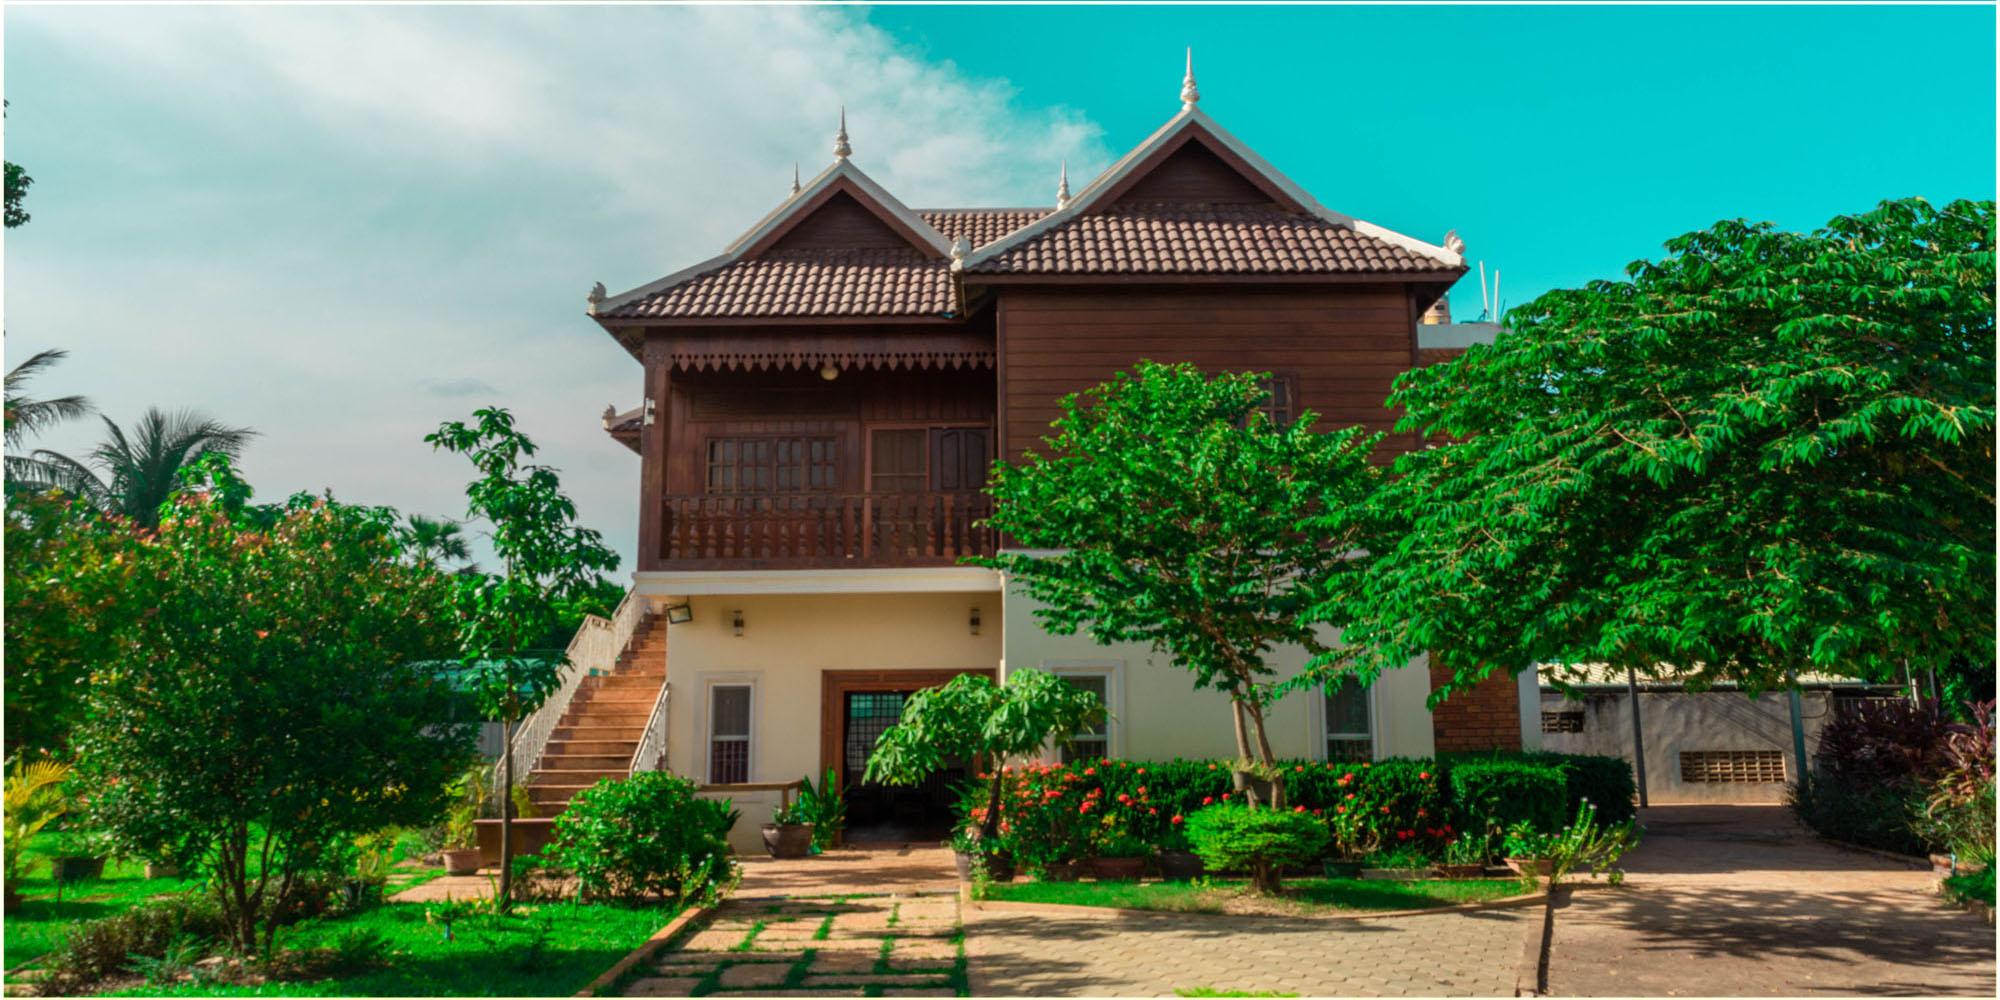 Marvelous and Greenish 03 – Bedroom Wooden House for Rent in Siem Reap – Sala Kamreuk